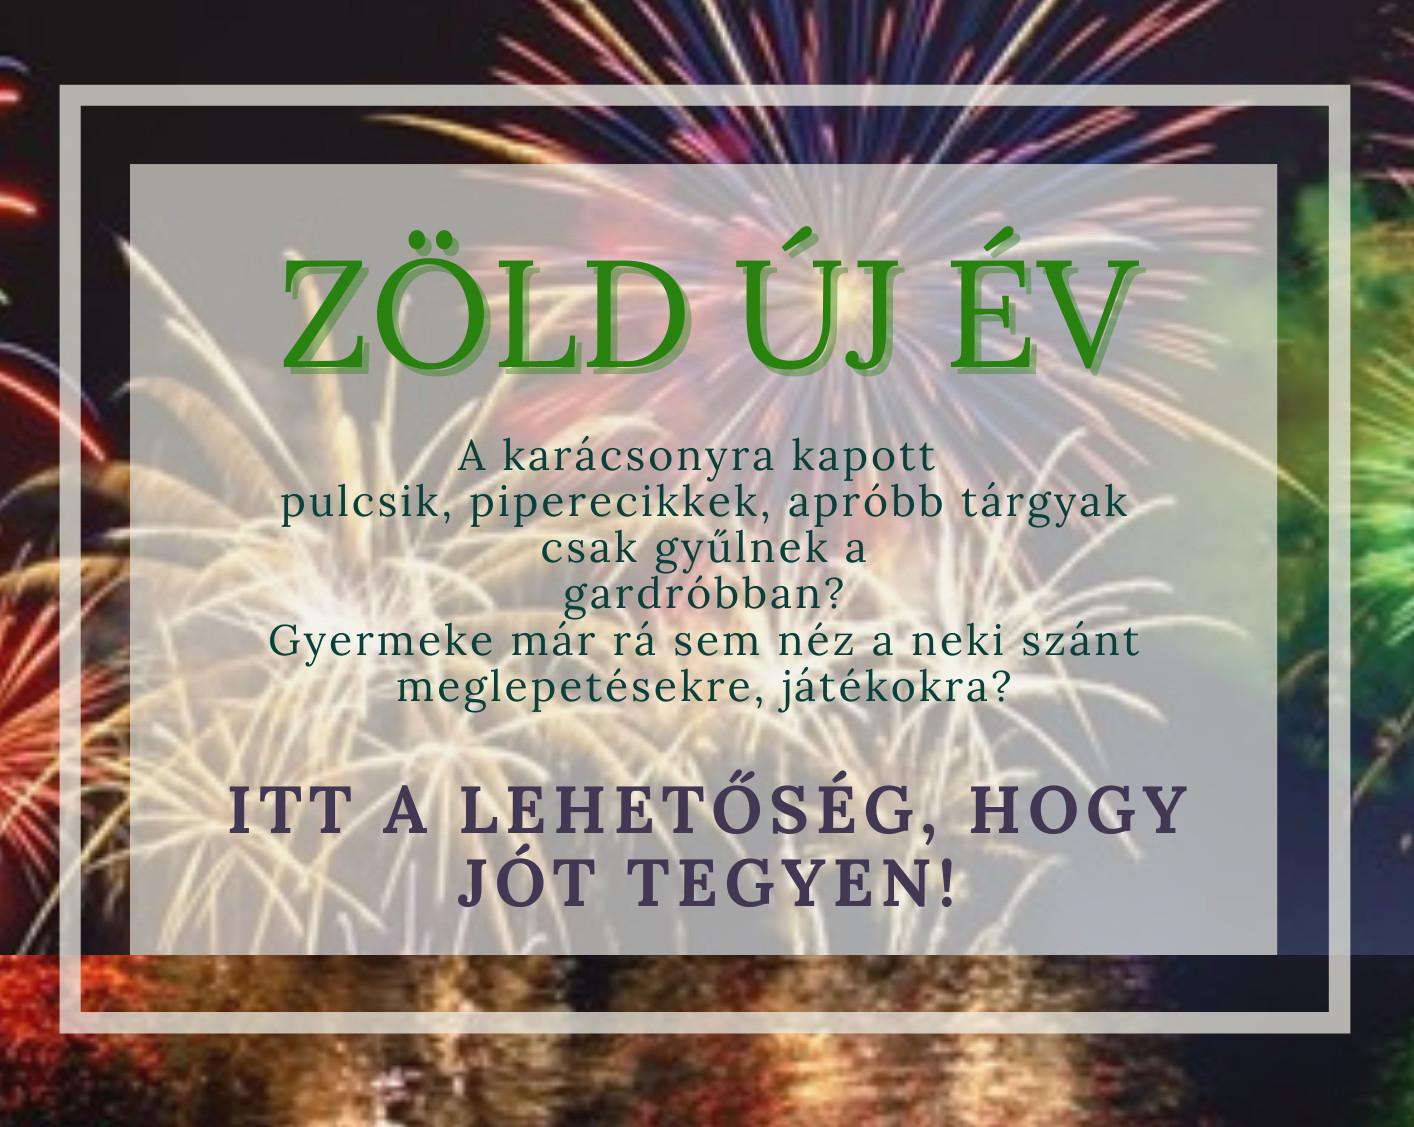 zold-ujev-poszter-2021-reszlet